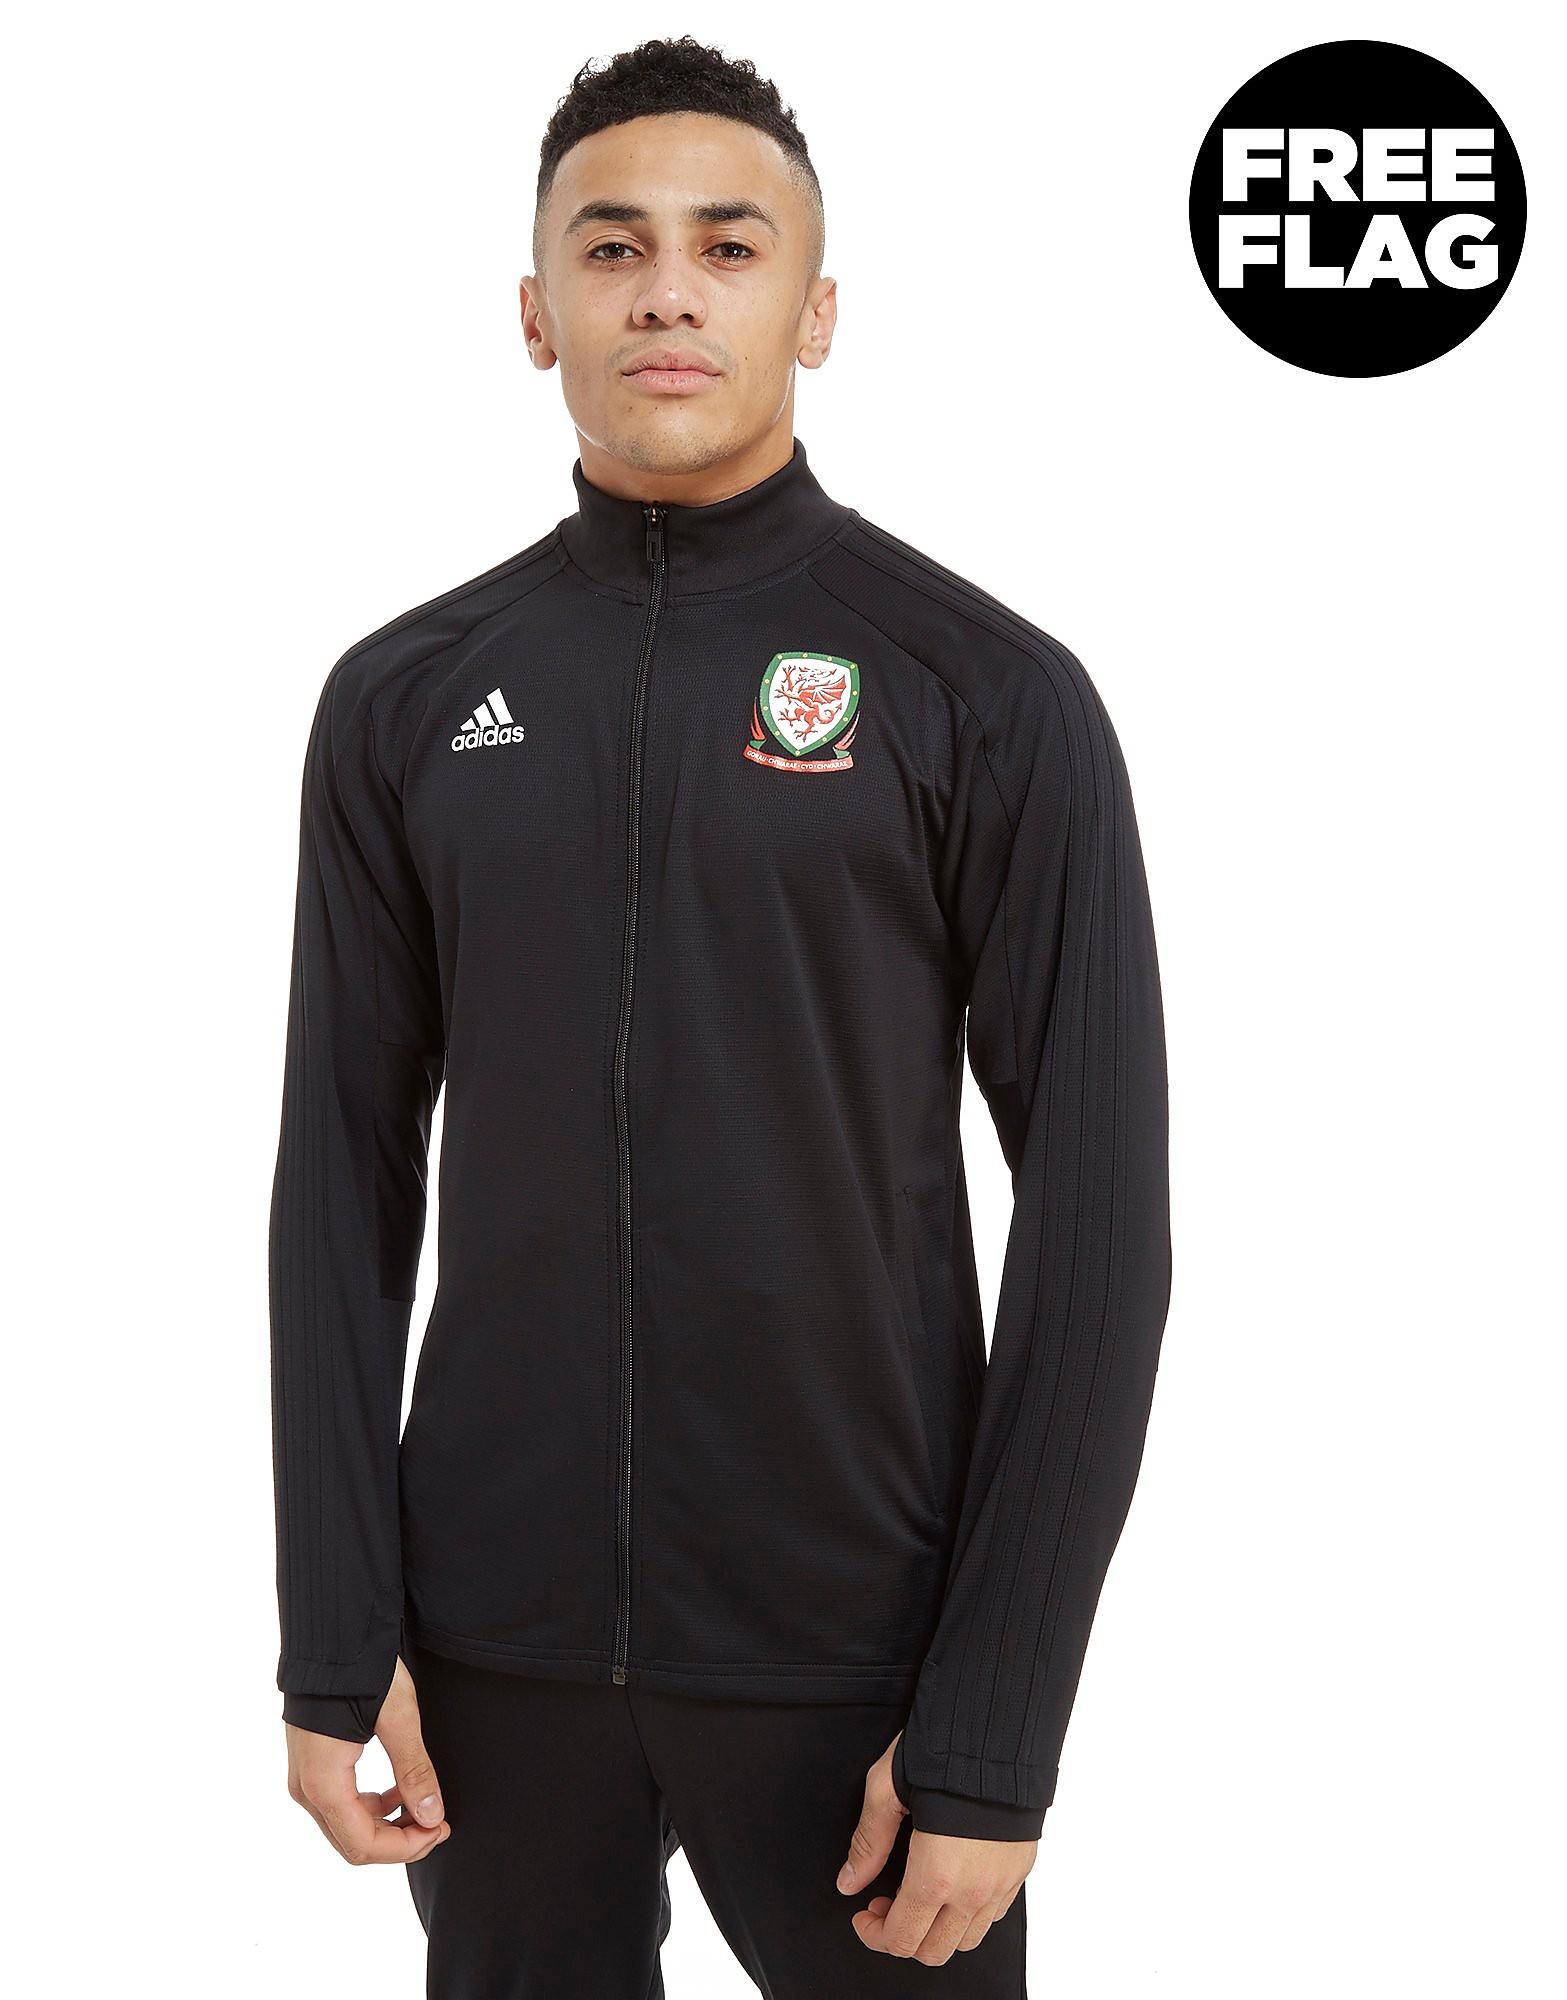 adidas FA Wales 2018 Full Zip Track Top